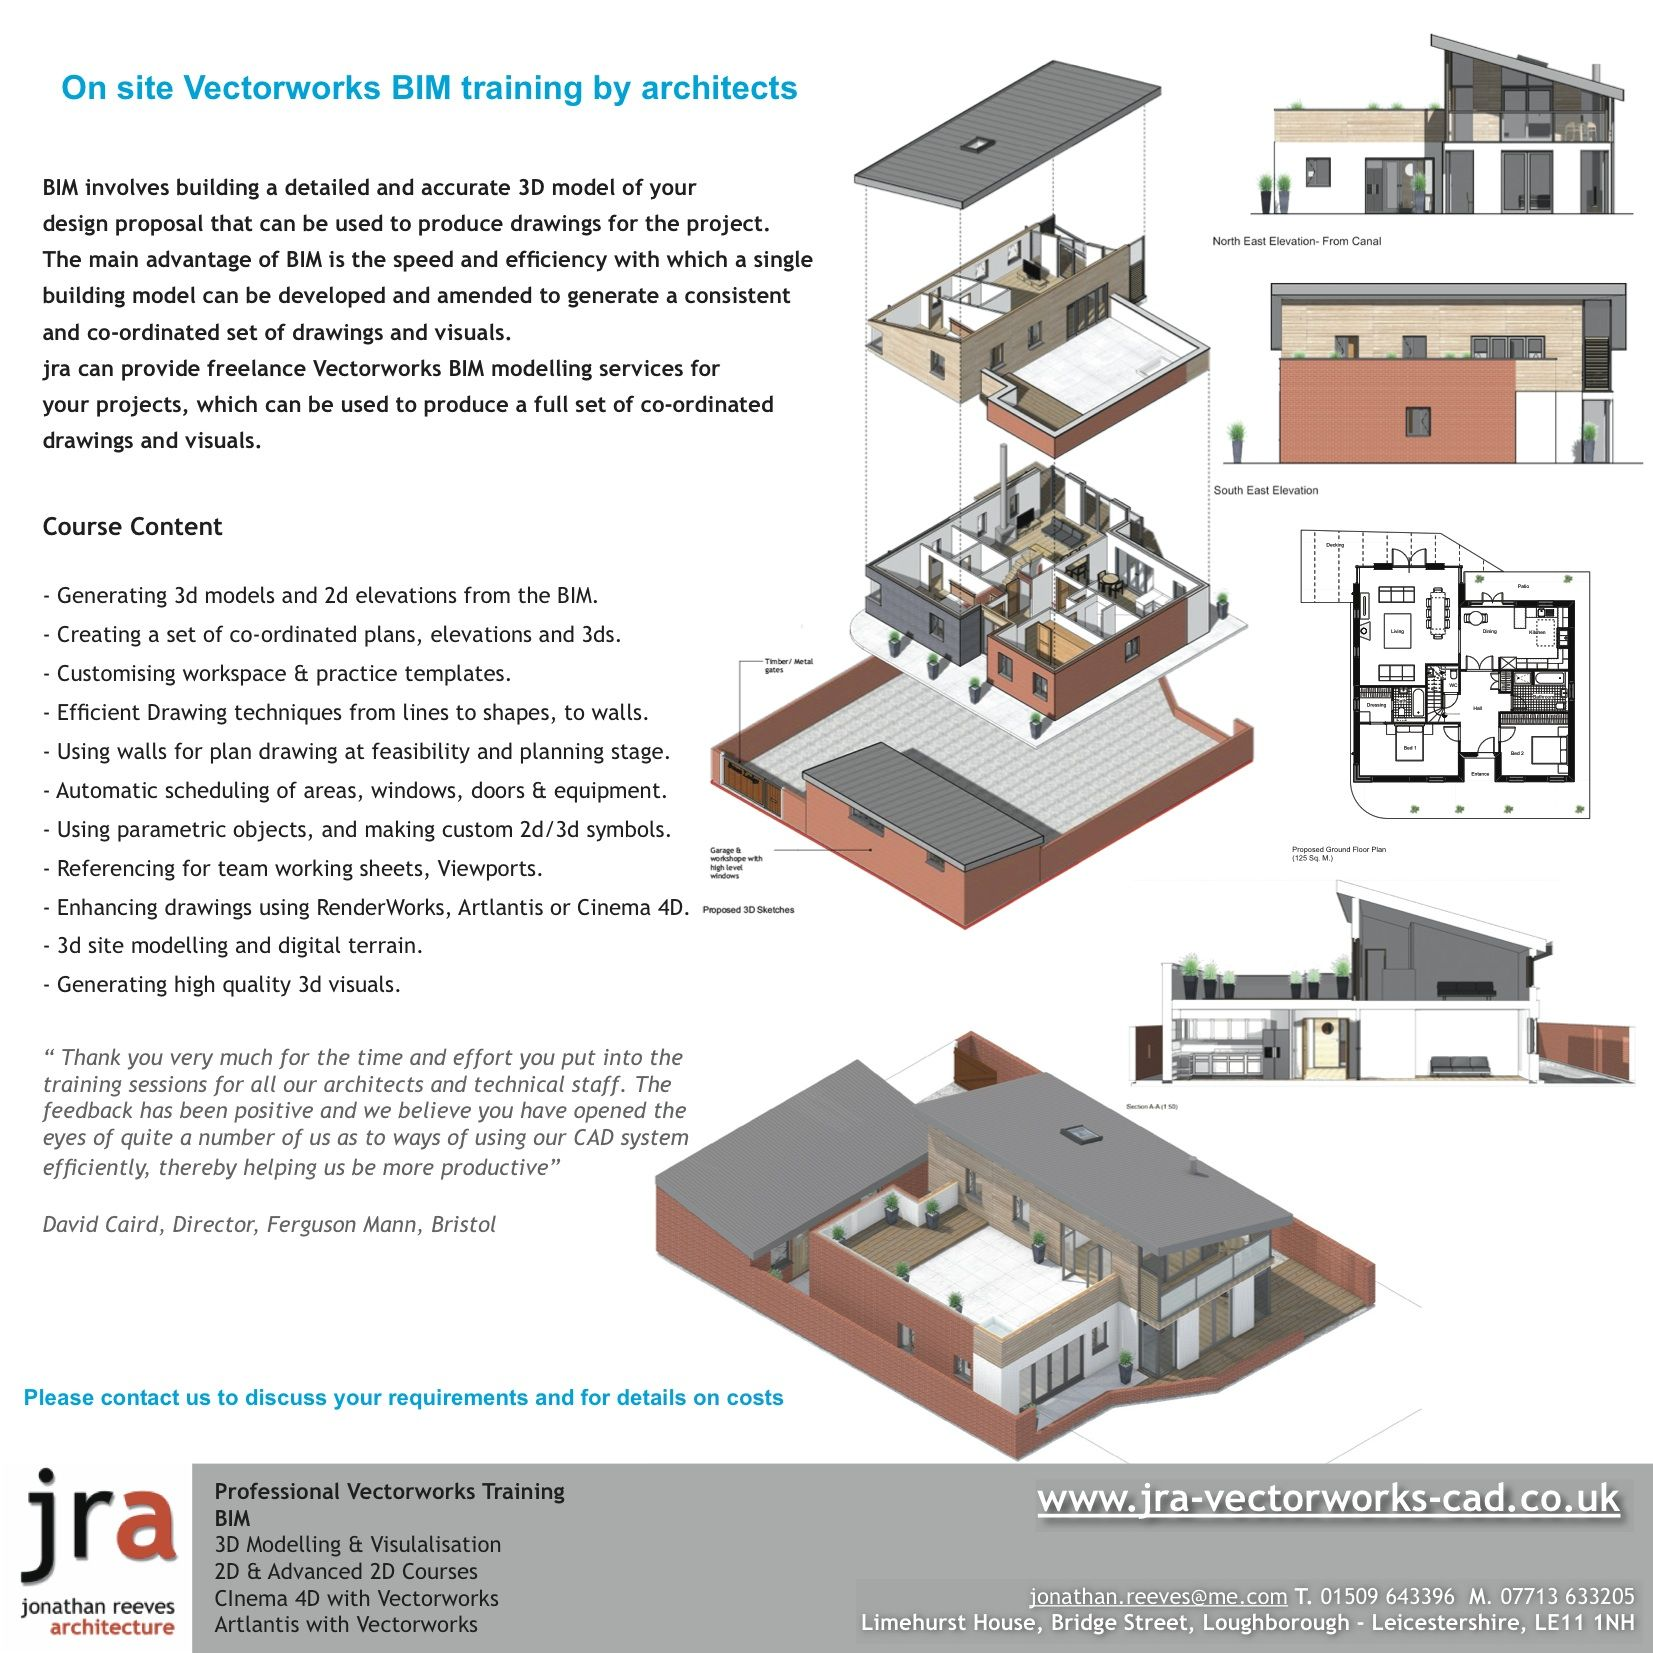 jra Vectorworks Training provides professional CAD training